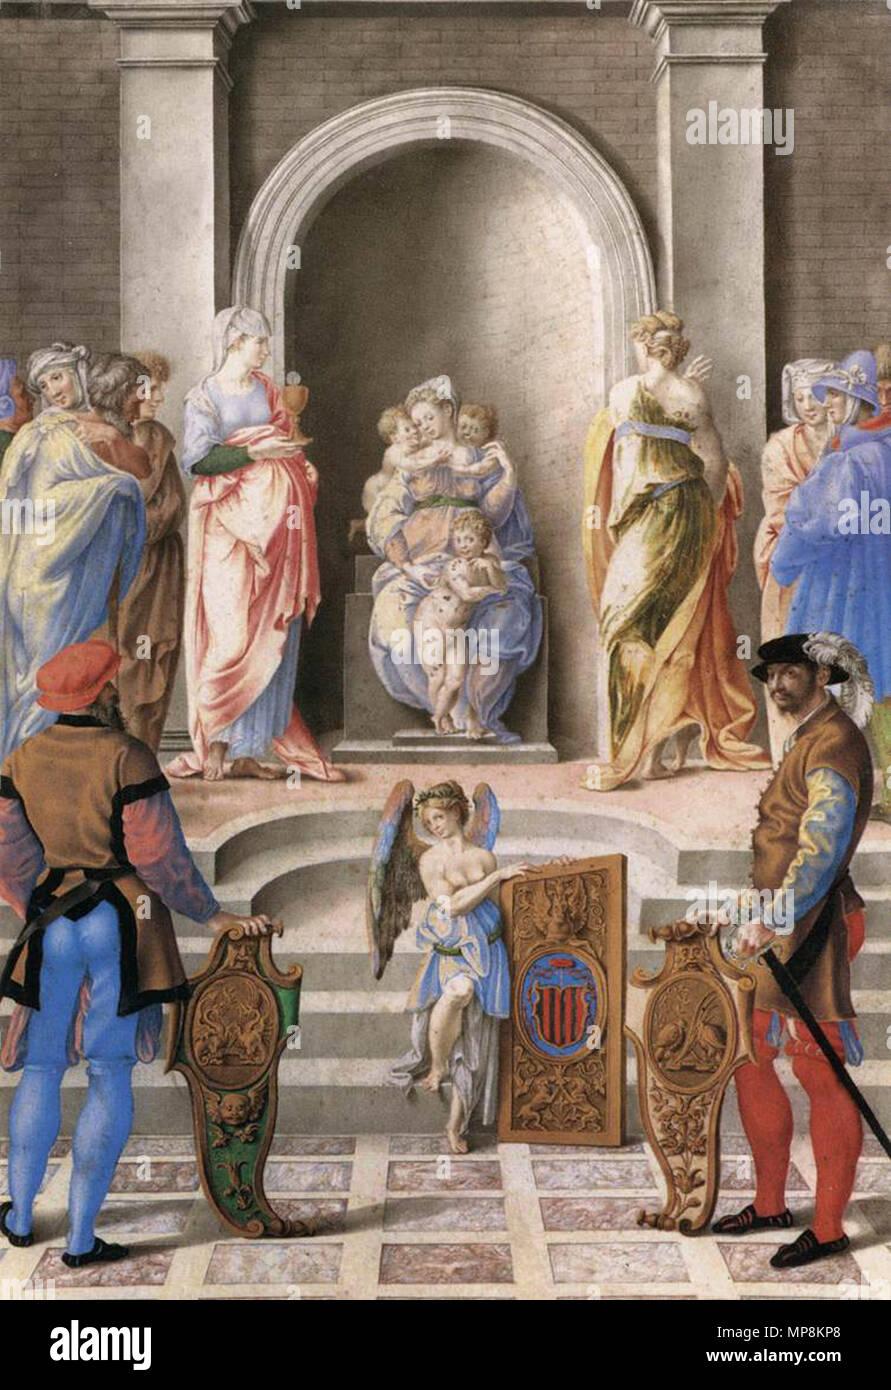 Tres Virtudes Teologicas Fotos e Imágenes de stock - Alamy